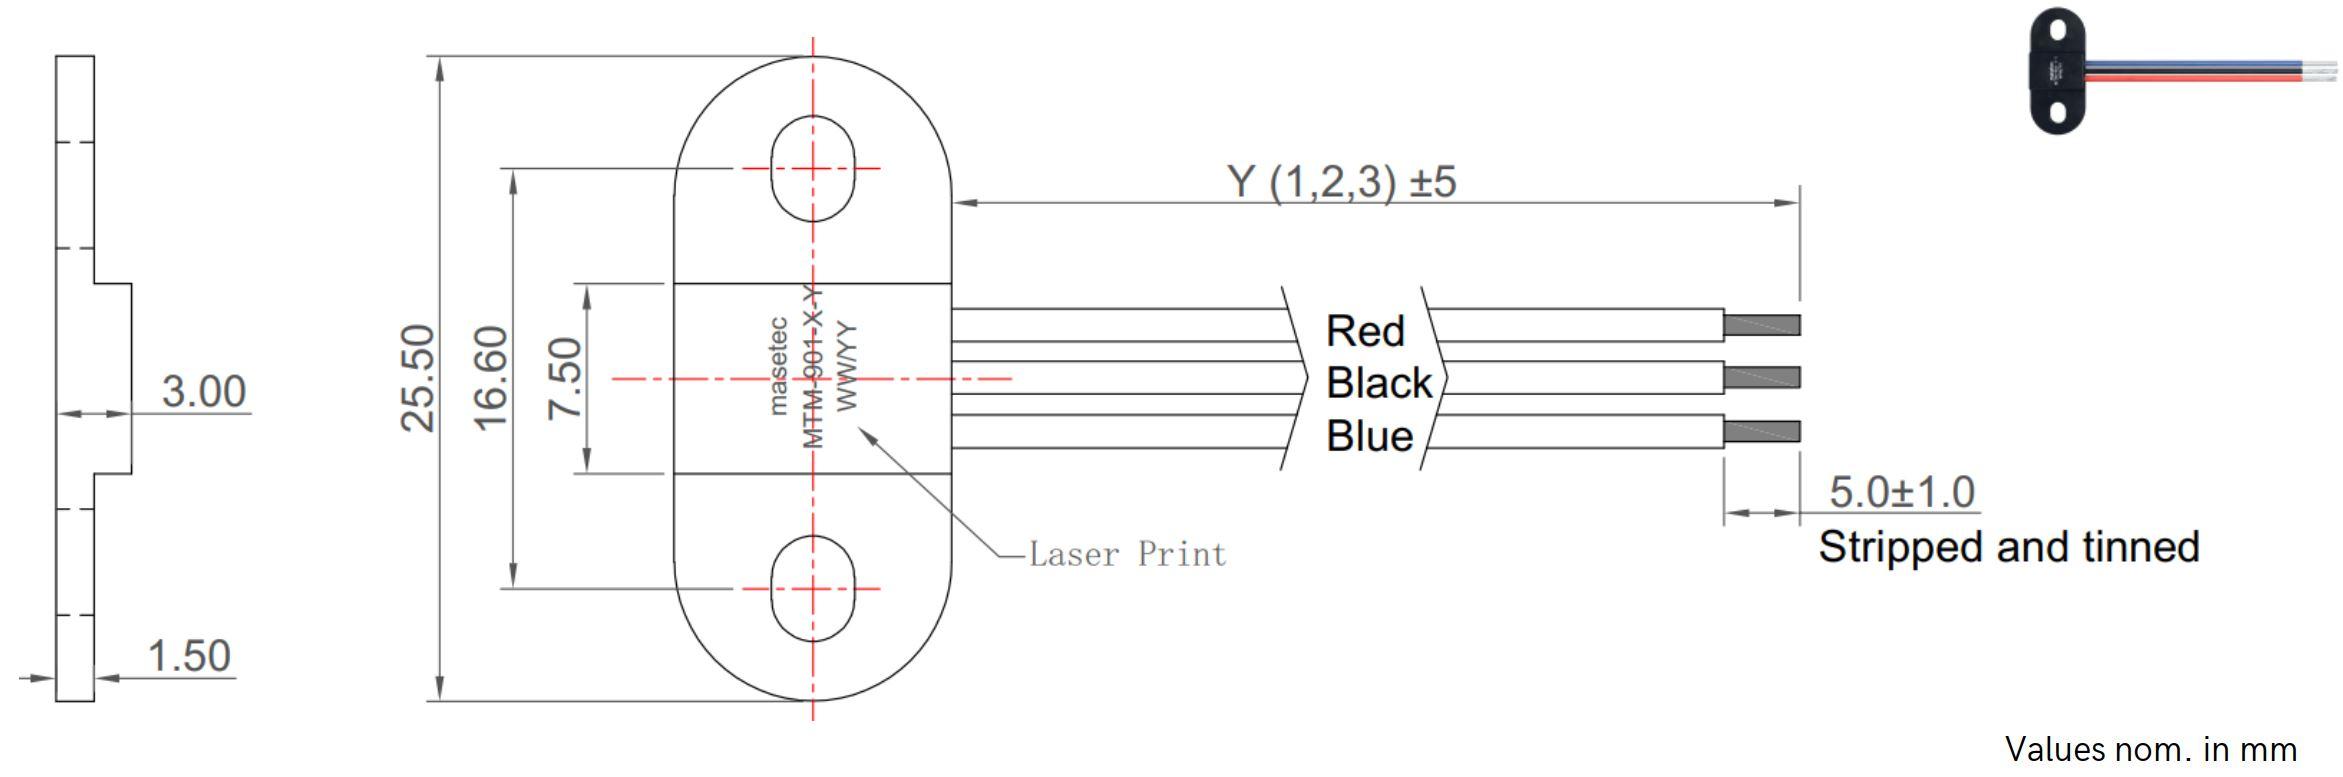 TMR Sensor Bipolar Switch MTM-901-5